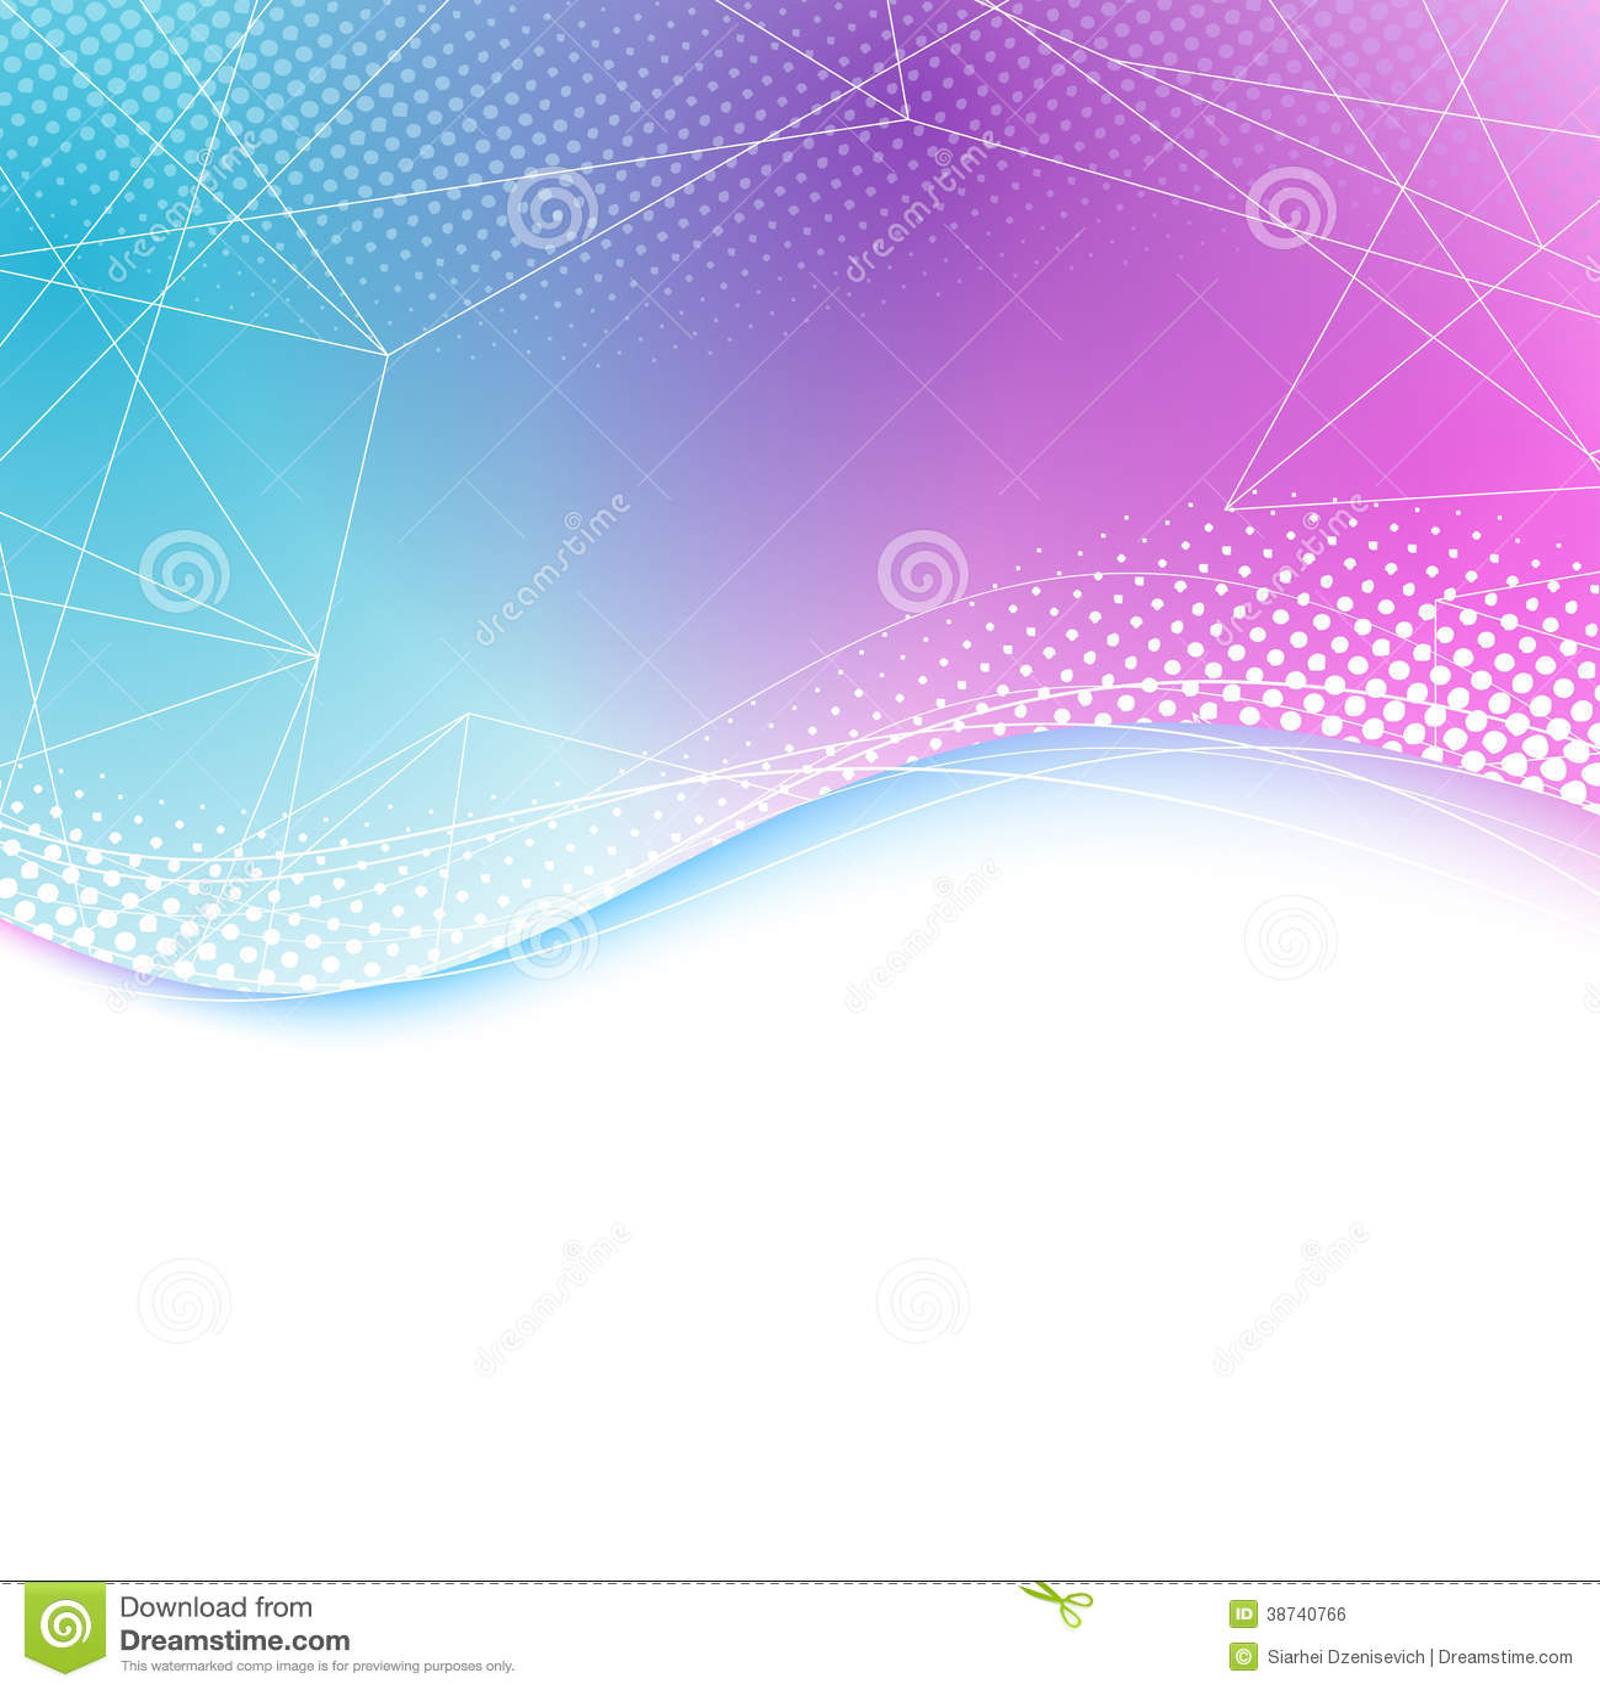 ... Lines Background Border Royalty Free Stock Image - Image: 38740766